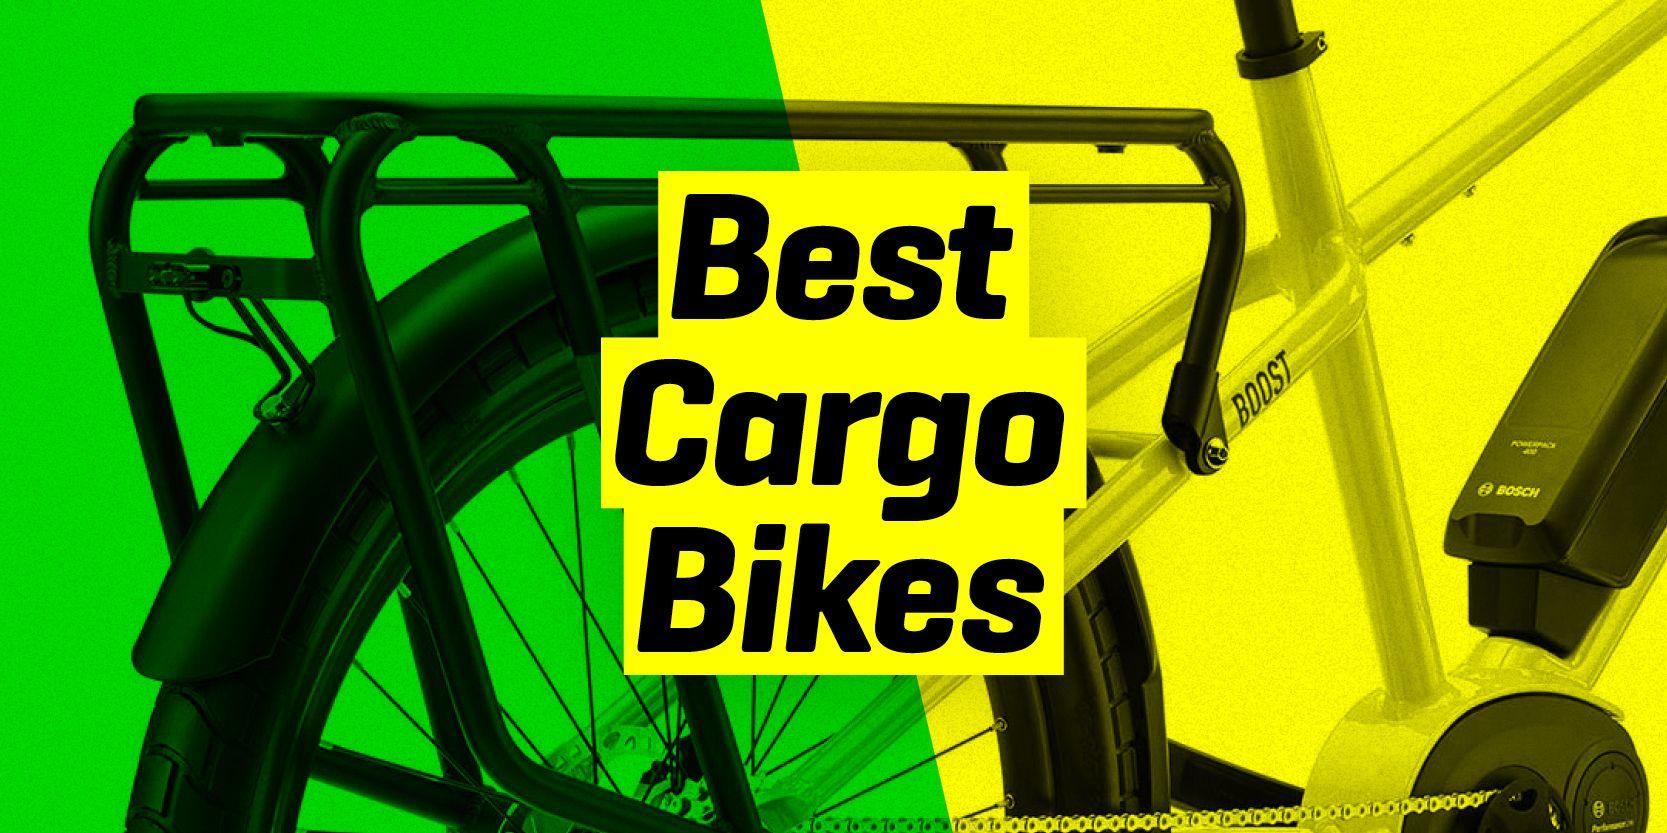 Cargo Bike Reviews – 9 Best Cargo Bikes 2019